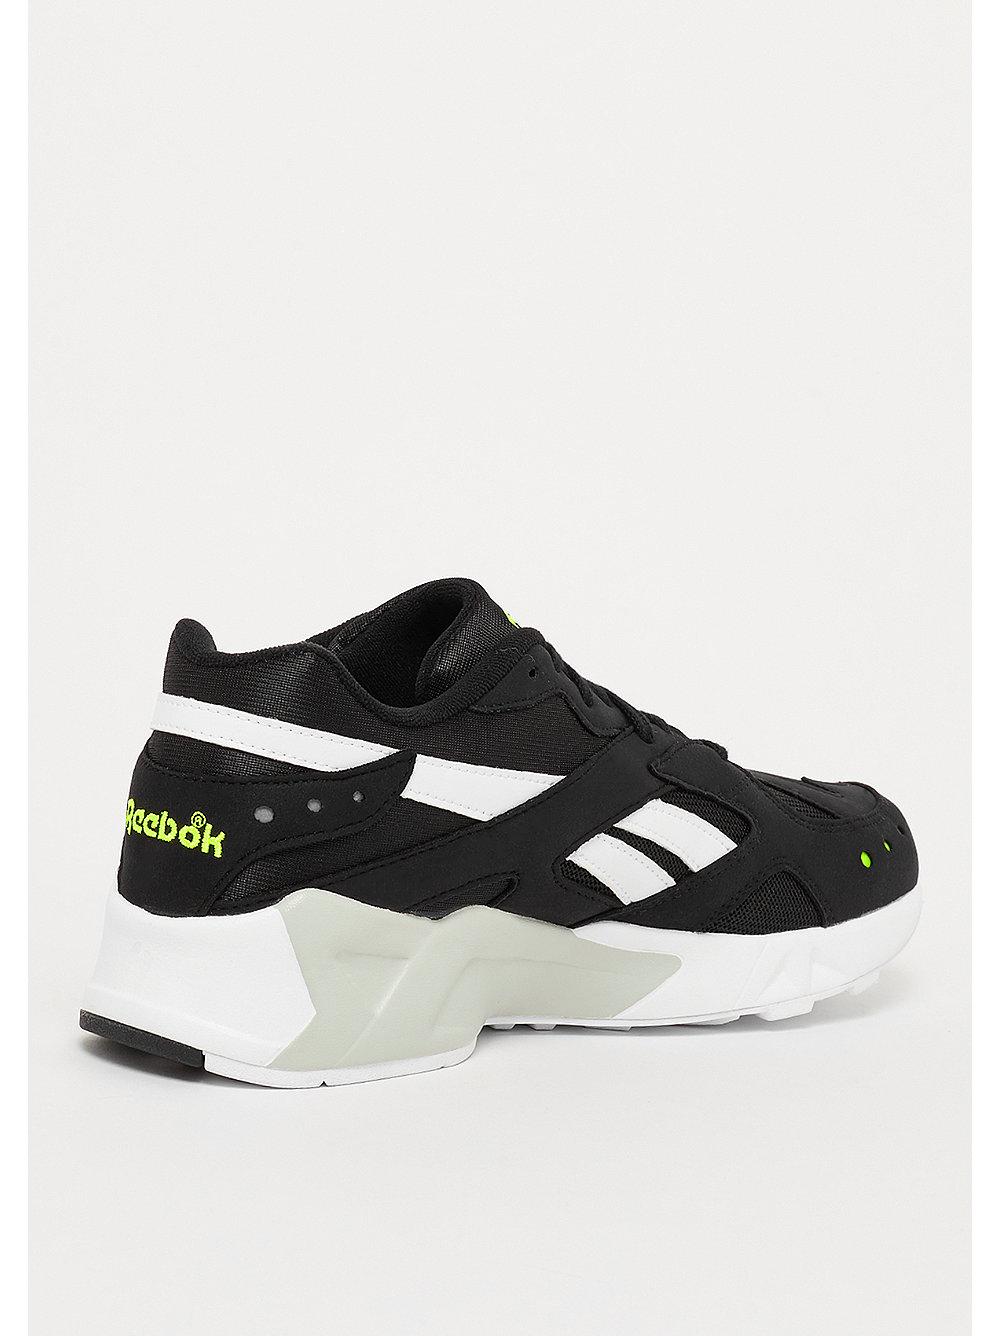 70cbc2fd0cc reebok aztrek black Reebok Aztrek black sneakers bij SNIPES bestellen!